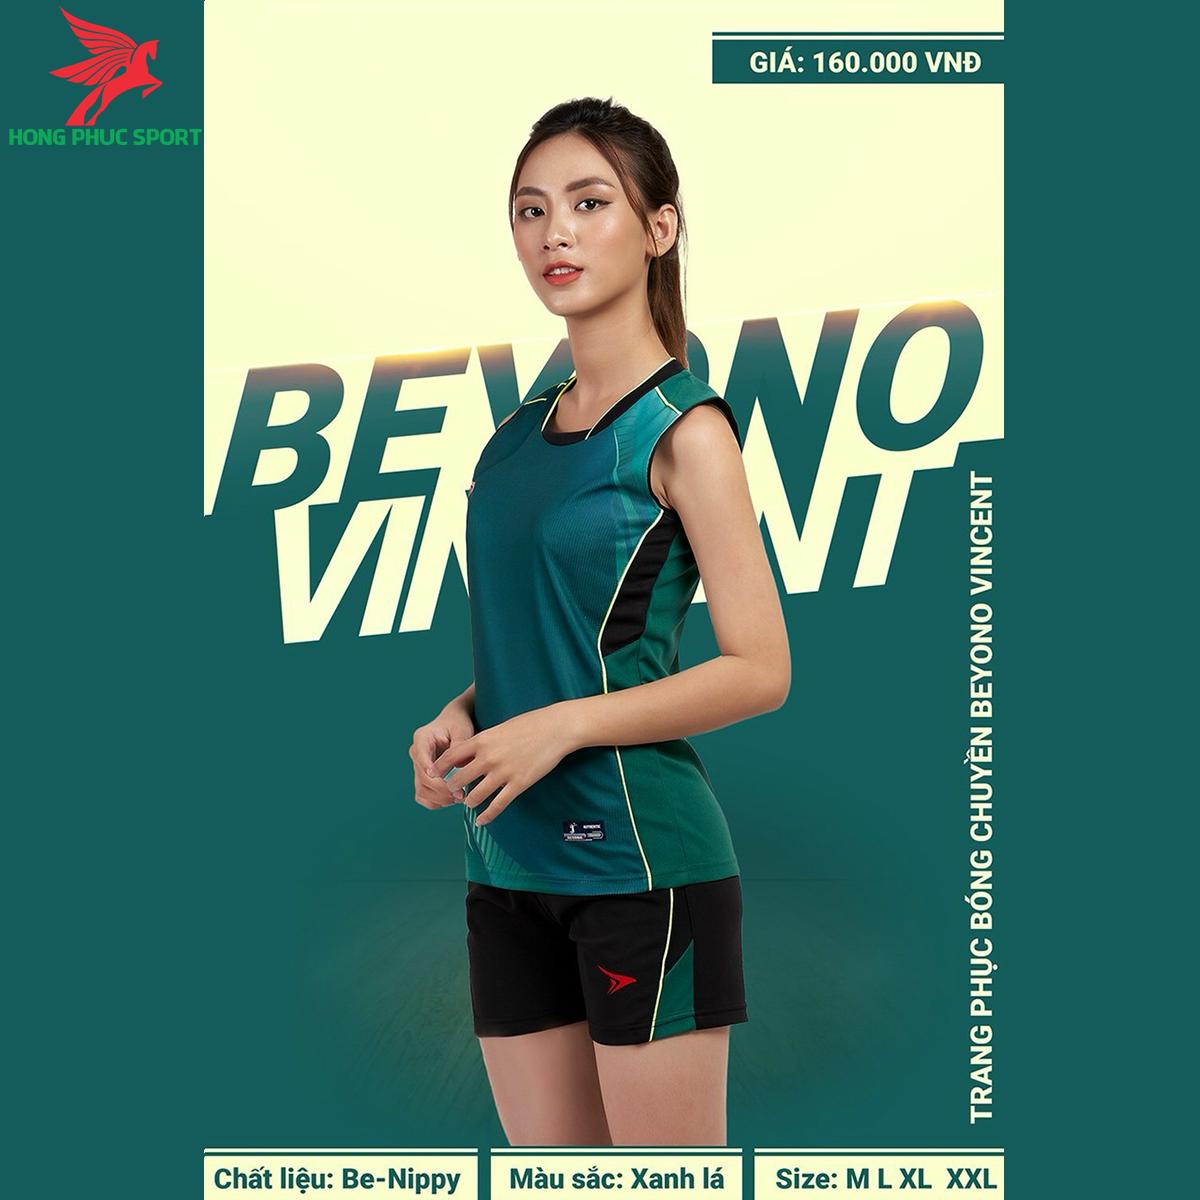 https://cdn.hongphucsport.com/unsafe/s4.shopbay.vn/files/285/ao-bong-chuyen-beyono-vincent-mau-xanh-la-3-6039b9b95fb47.png